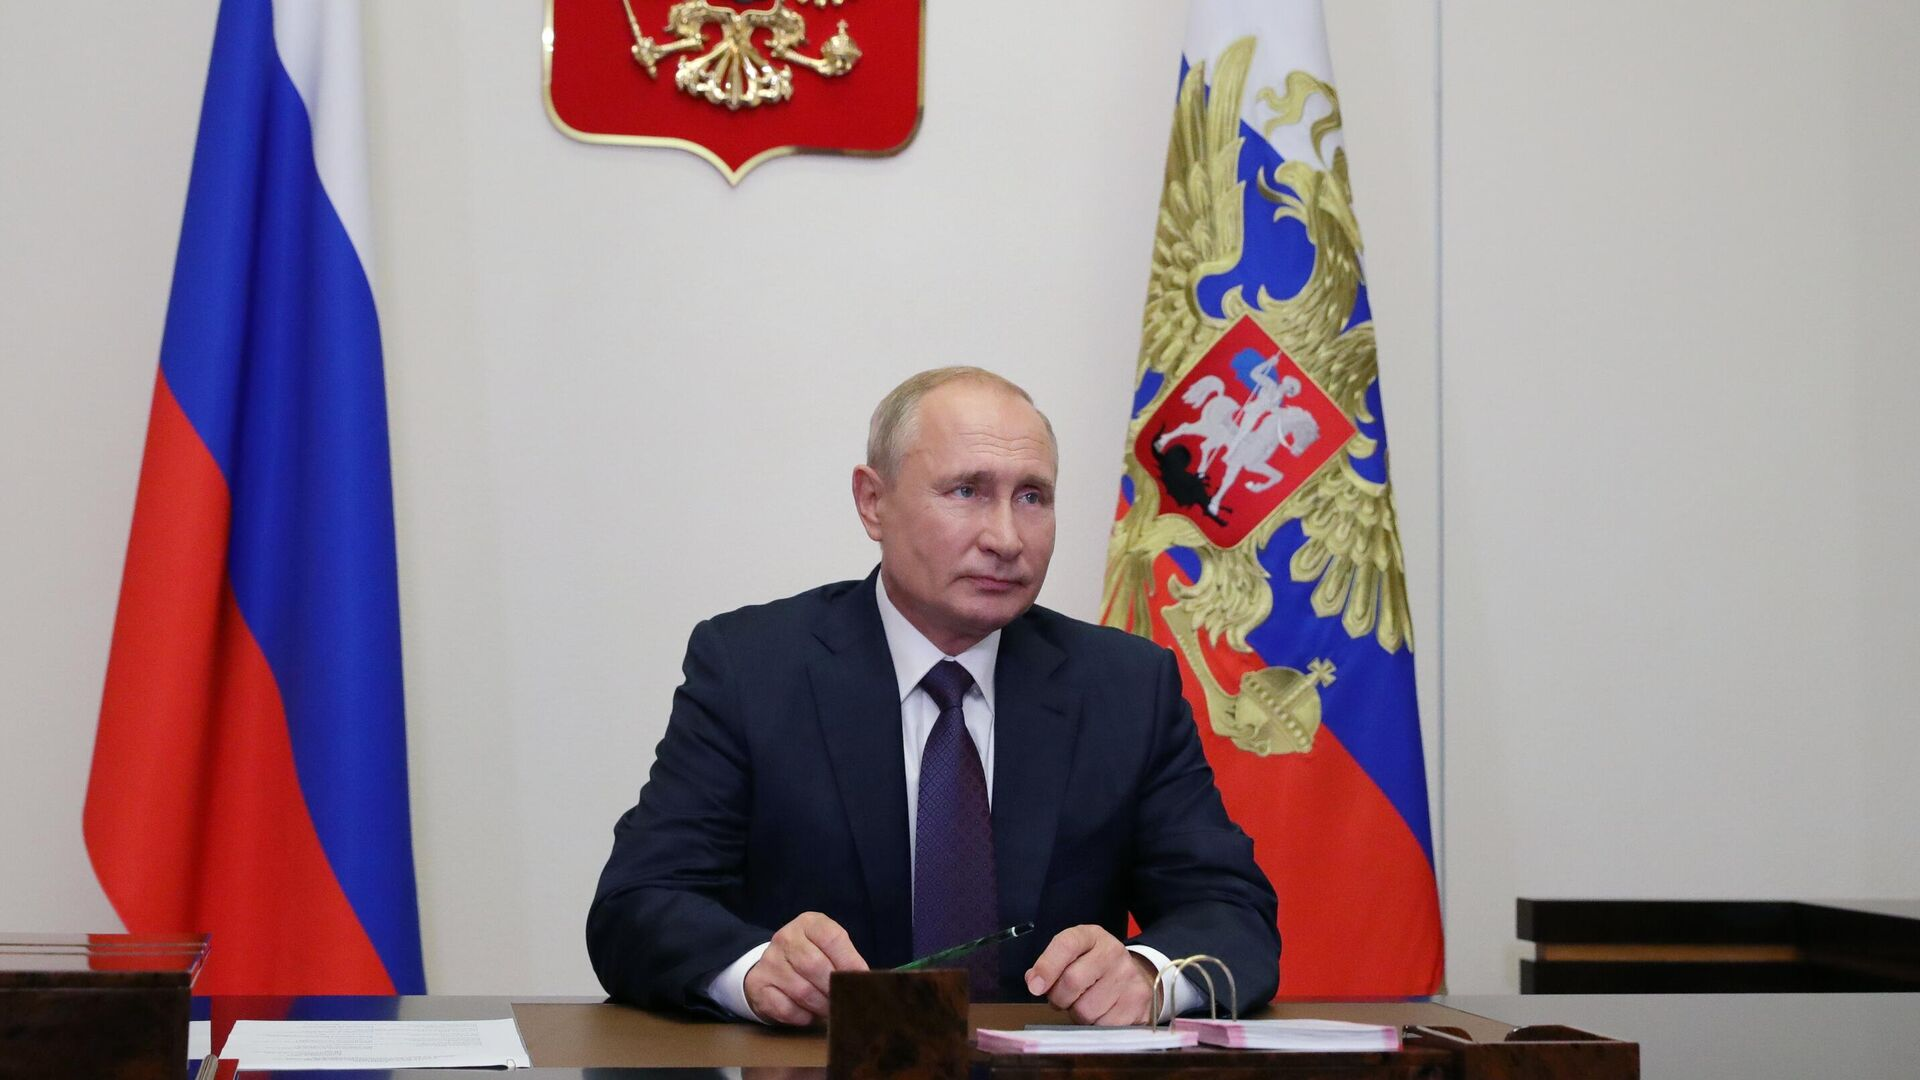 Президент РФ Владимир Путин - РИА Новости, 1920, 06.09.2020